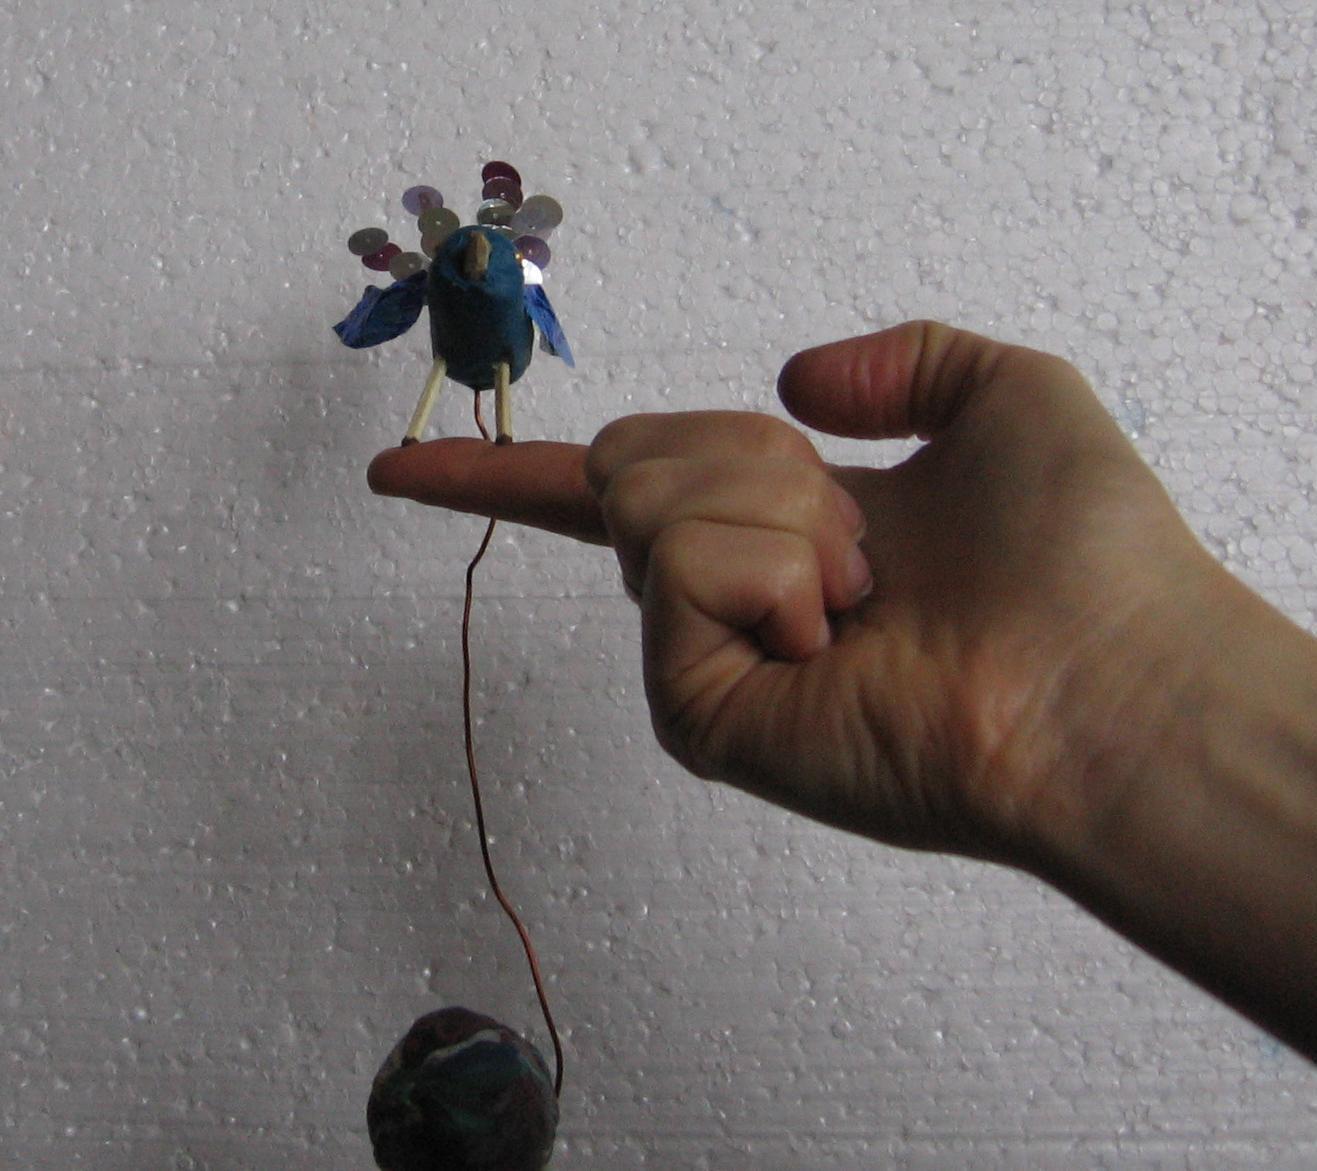 Балансирующие игрушки своими руками 57